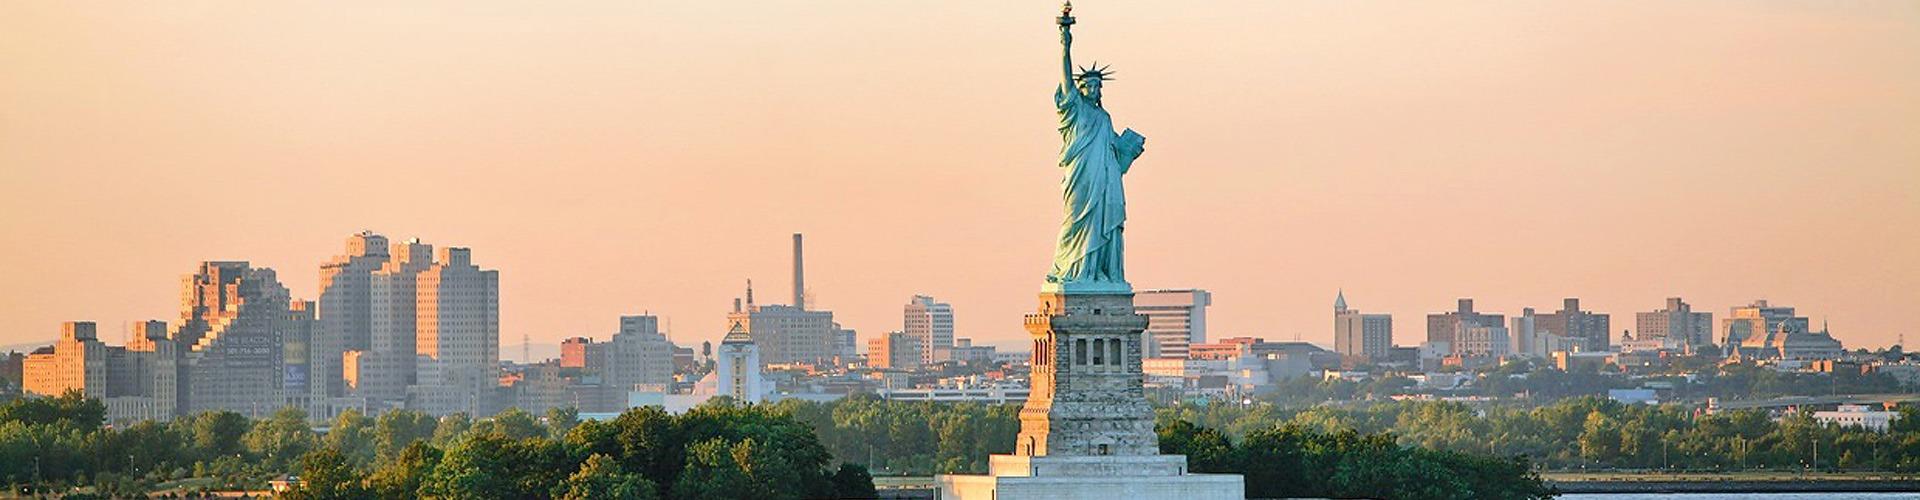 Nowy Jork - top